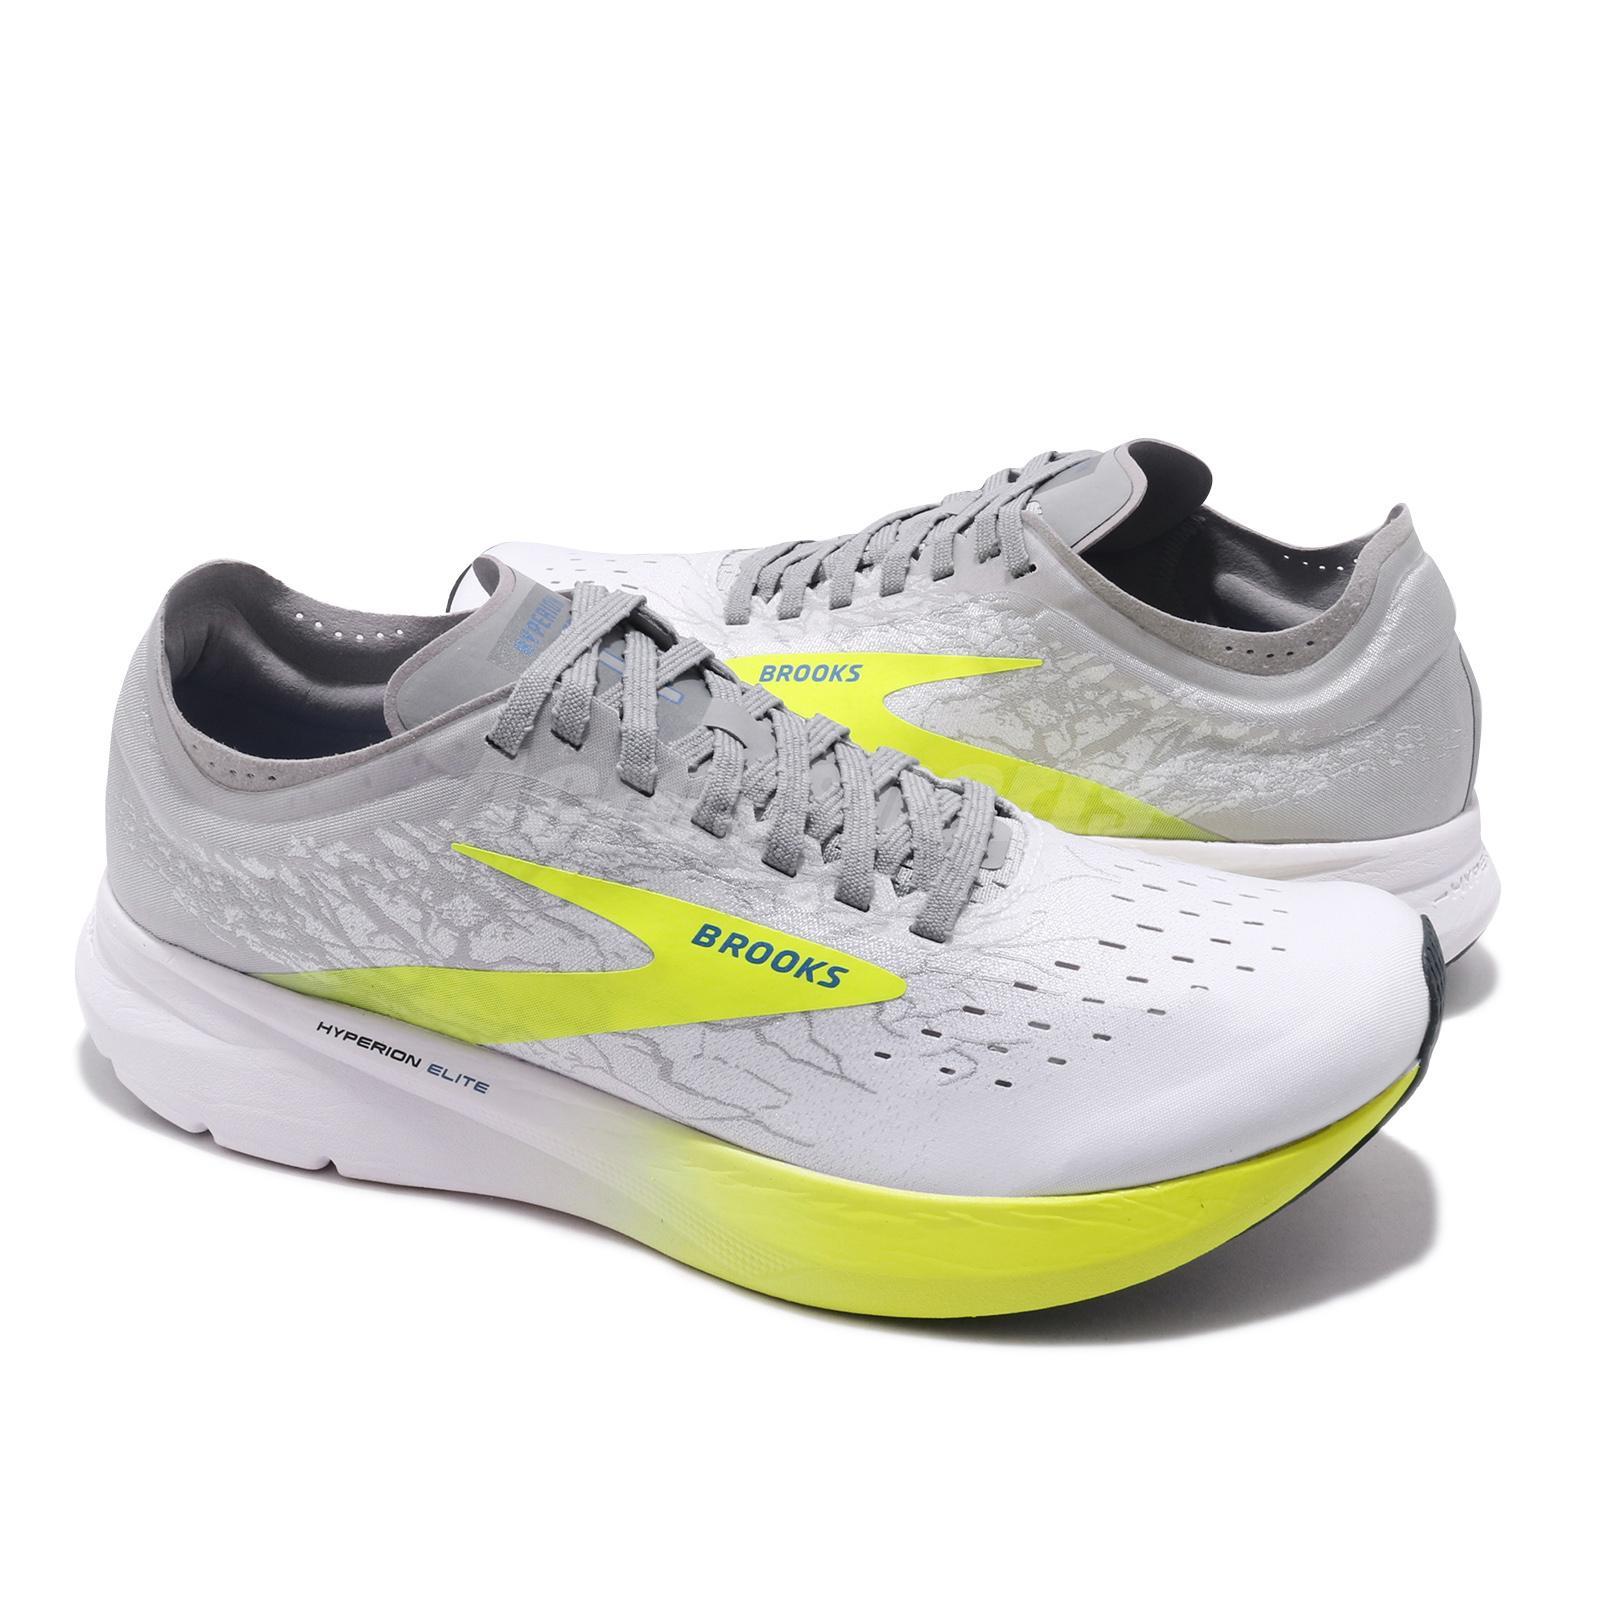 Brooks Hyperion Elite Carbon Grey Yellow White Men Running Shoes 100032 1D